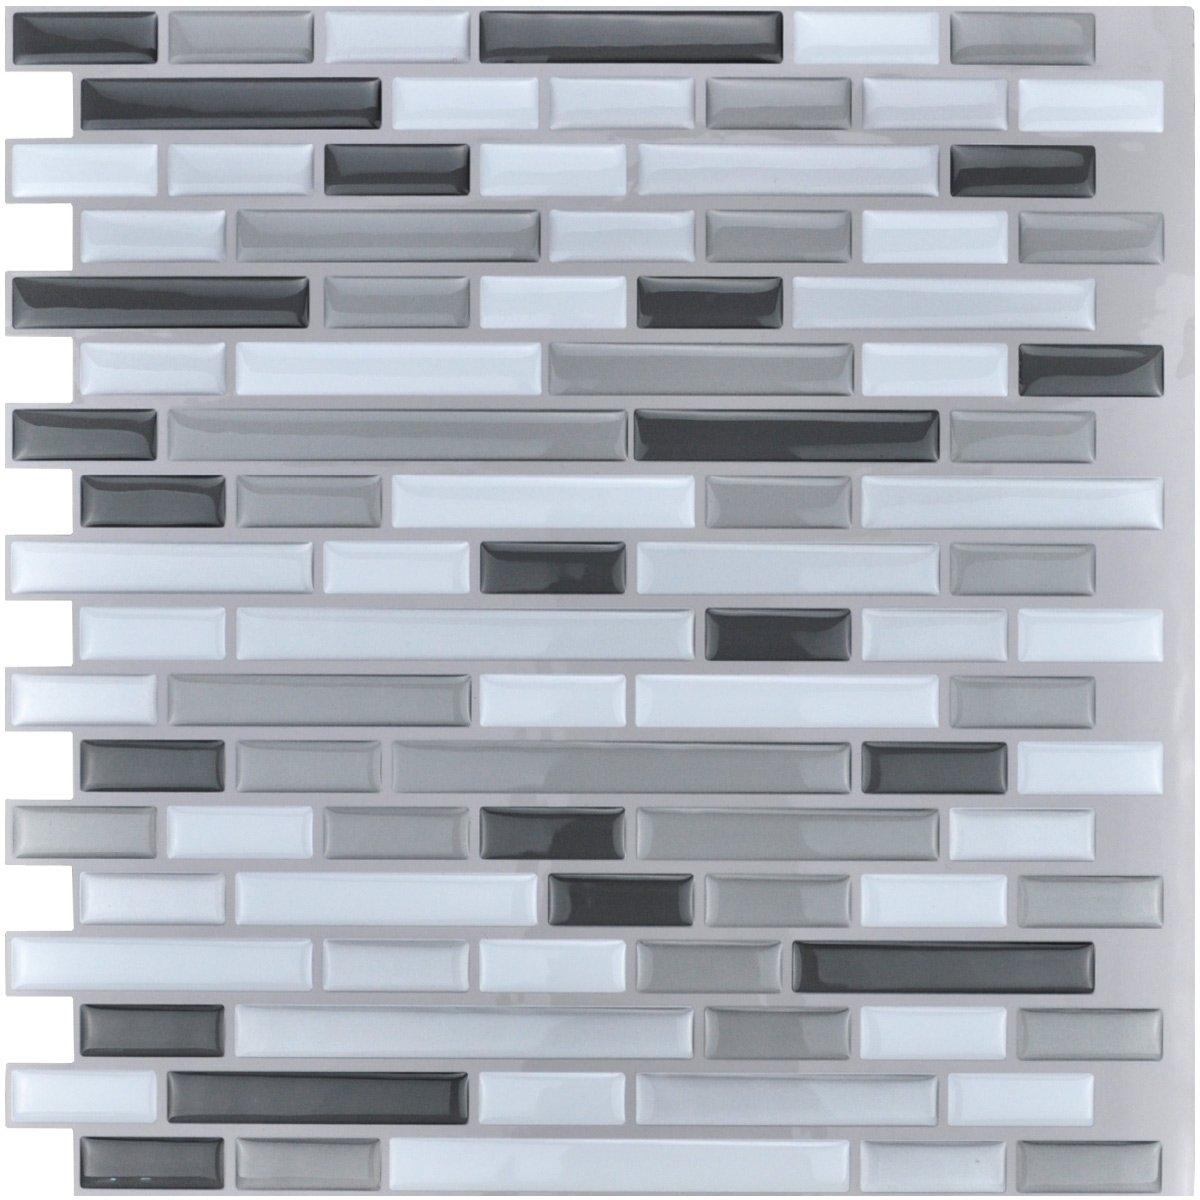 Art3d 10-Piece Stick on Backsplash Tile for Kitchen/Bathroom, 12'' x 12'' Gray-White Tile